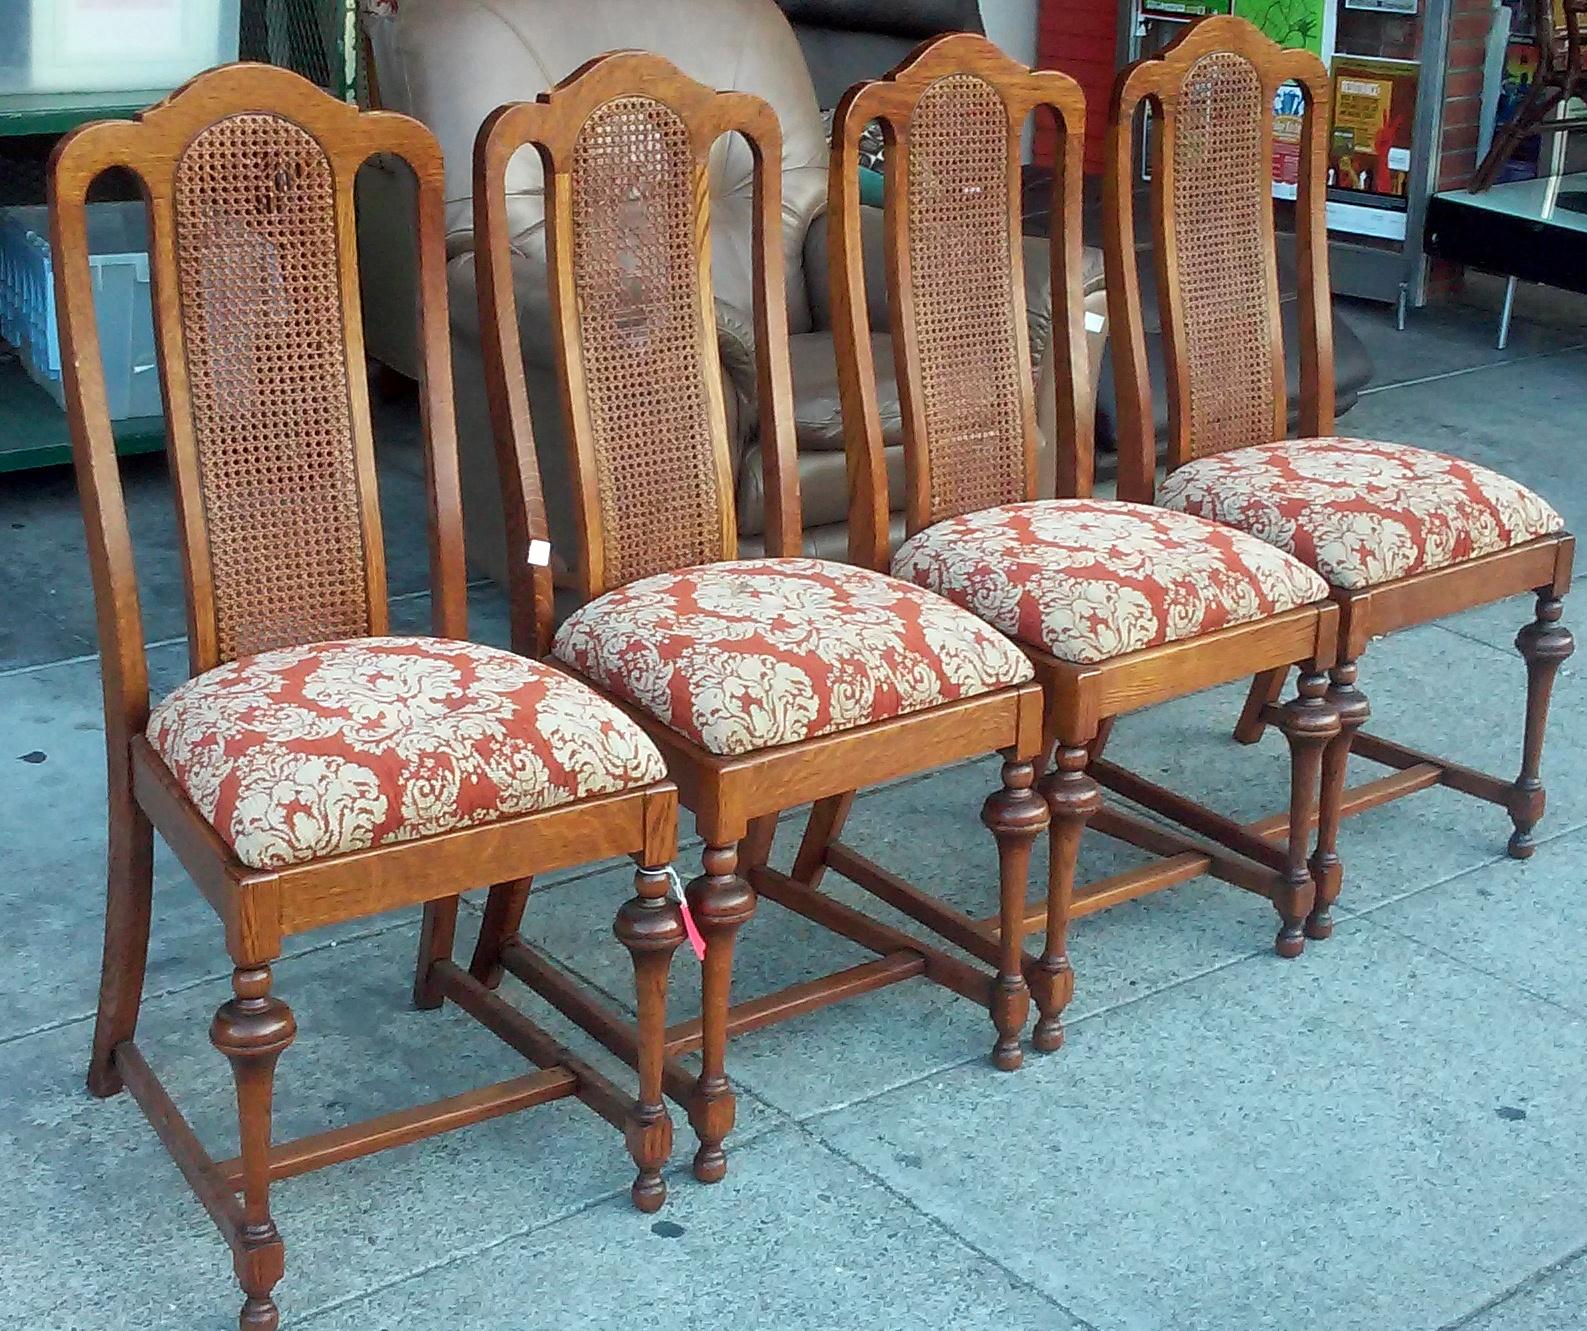 Uhuru Furniture Collectibles Sold 6710 Baroque Burnt Orange Vintage Oak Dining Chairs 60